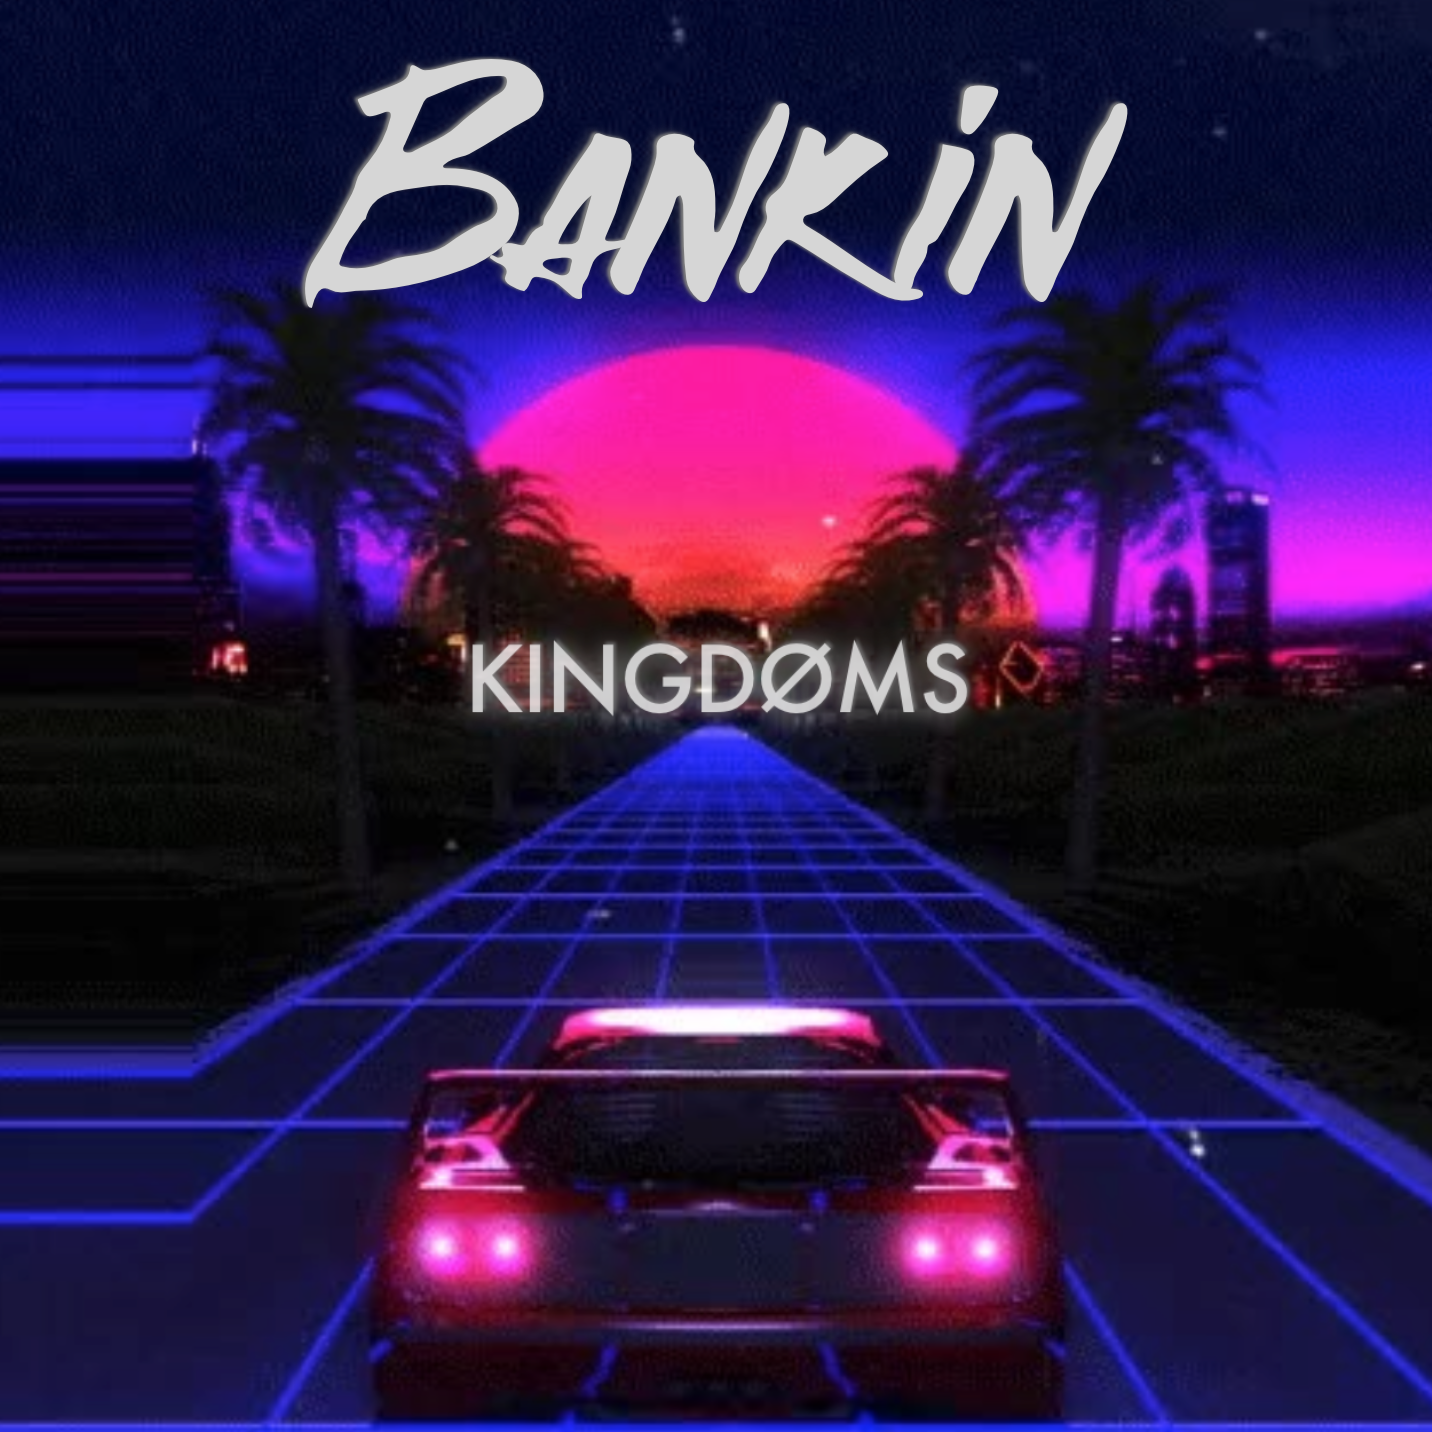 kingdoms - bankin.png